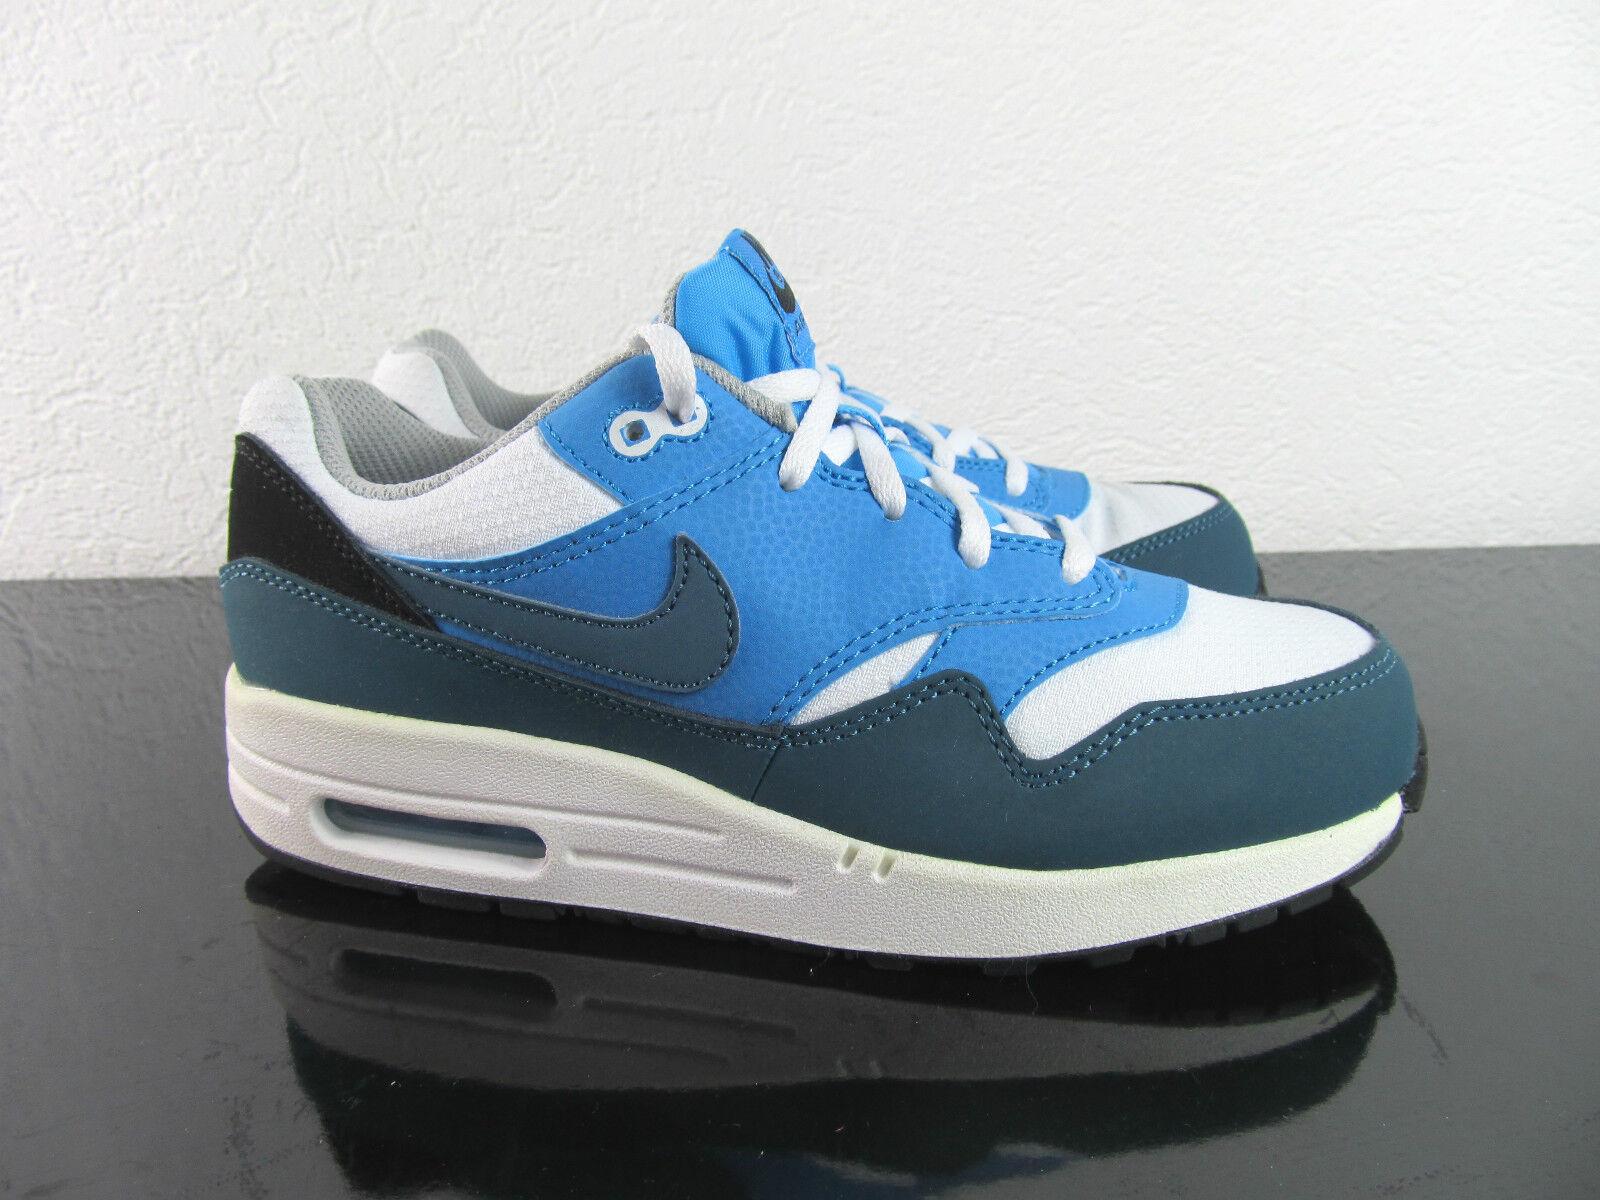 Nike Air Max 1 cipők White Night Factor élénk kék EUR_35 39